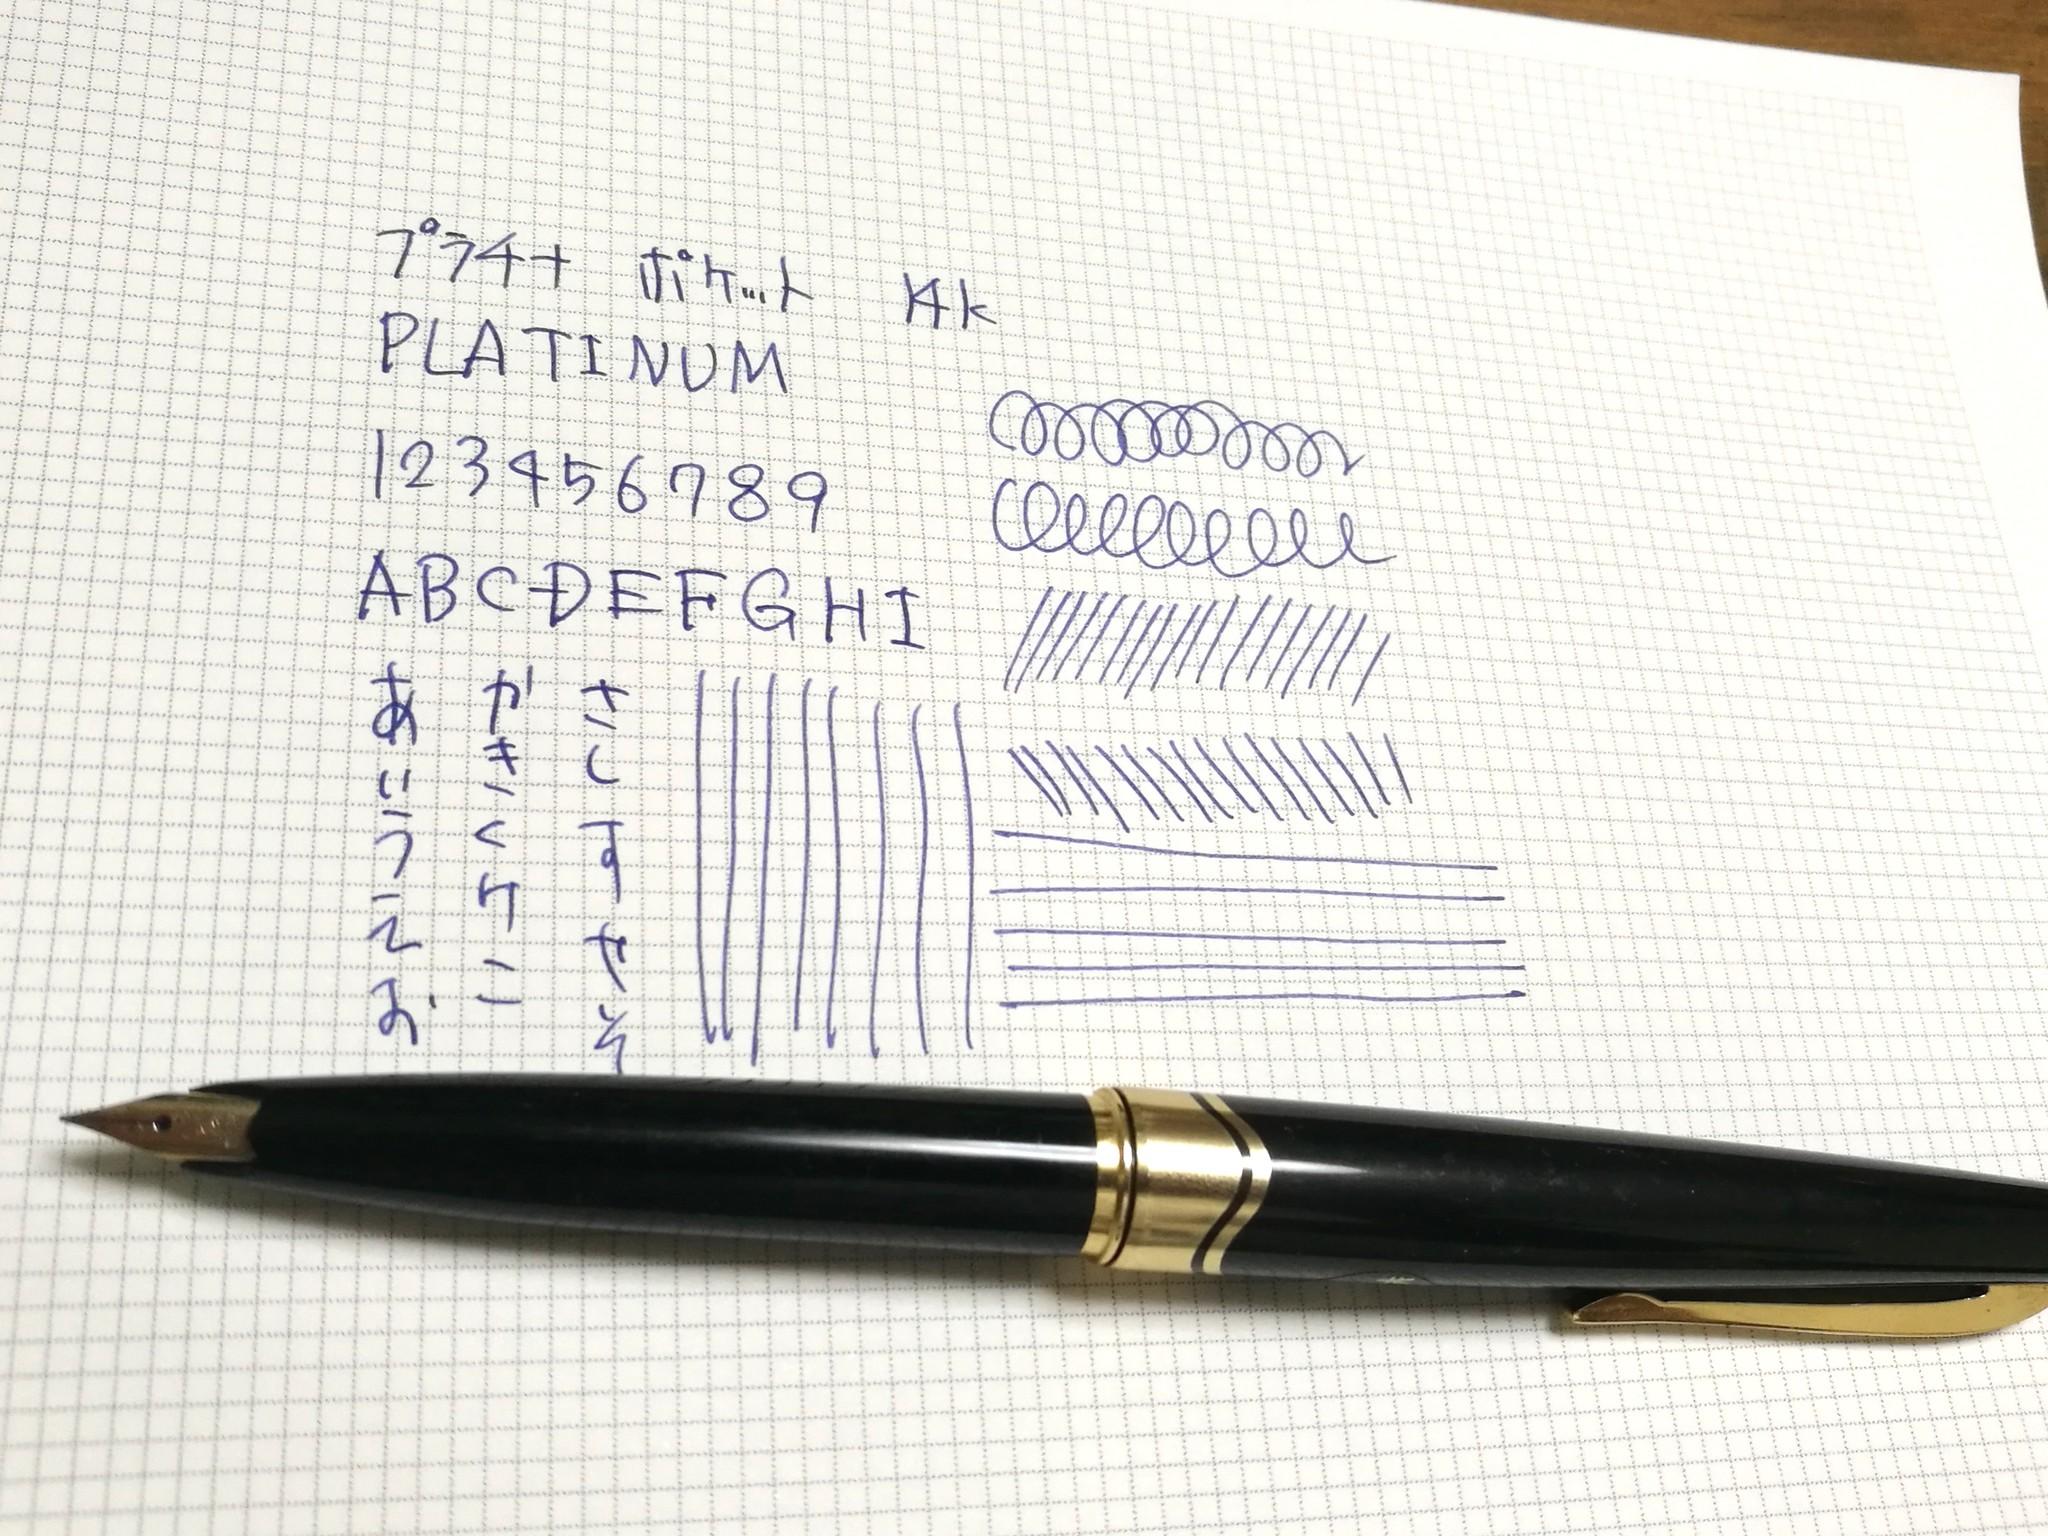 '70s プラチナ ポケット PLATINUM (細字) 14K     01432